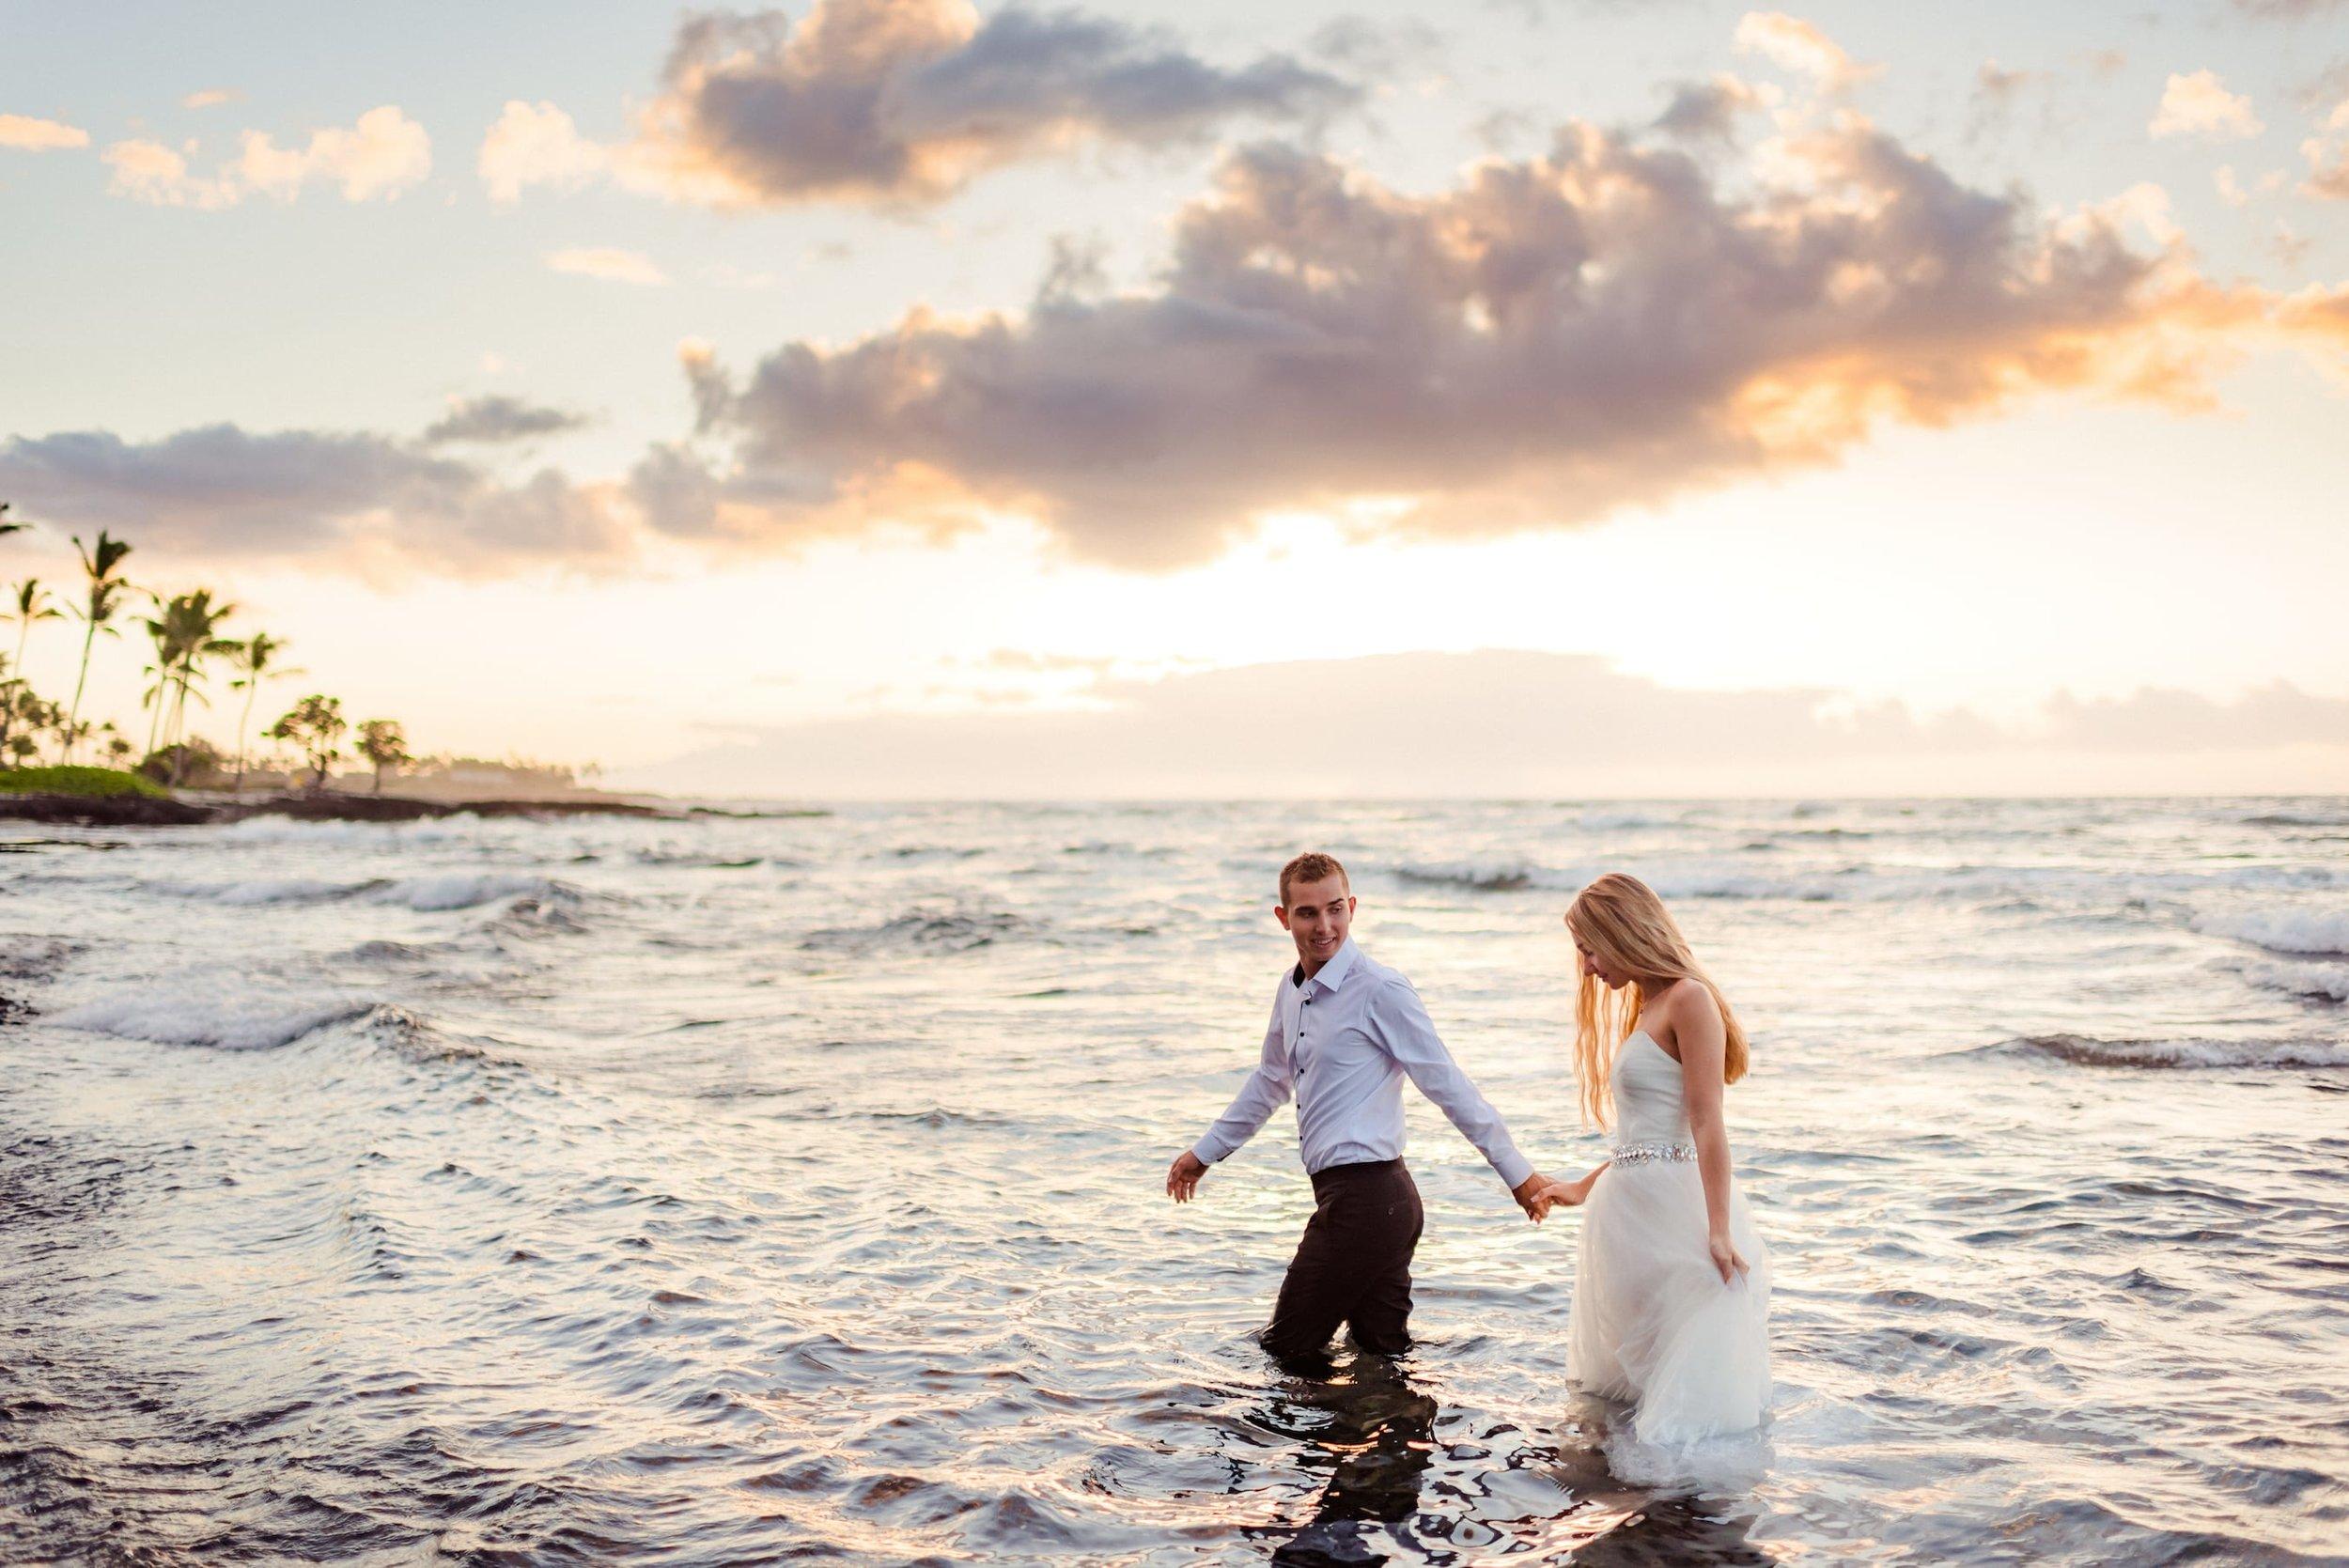 Big-Island-Elopement-Private-Wedding-Hawaii-Beach-15.jpg